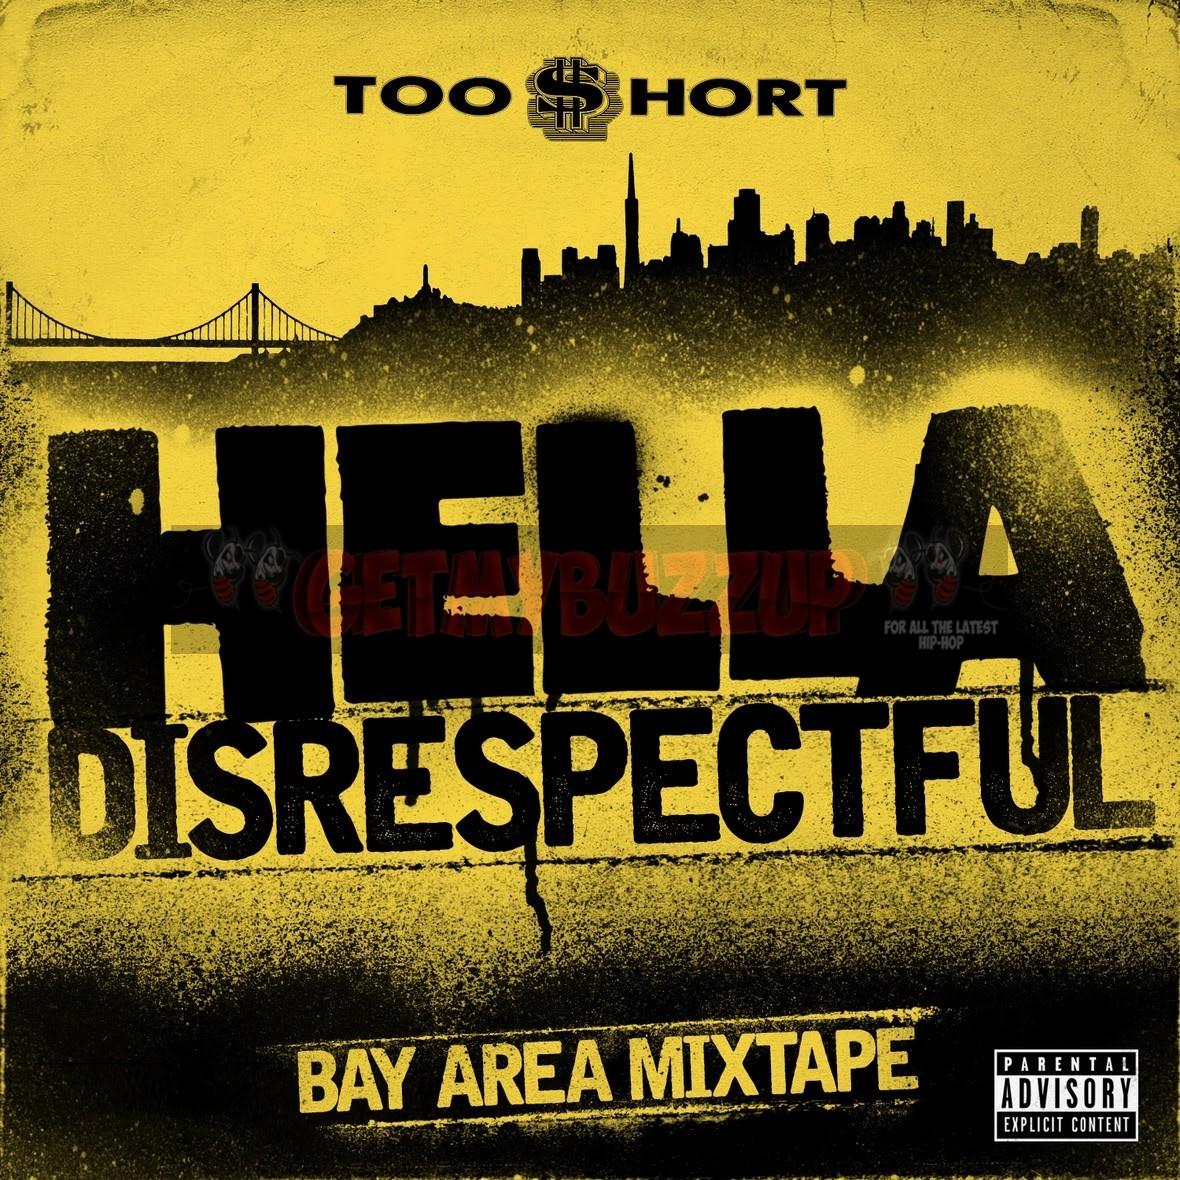 Too $hort